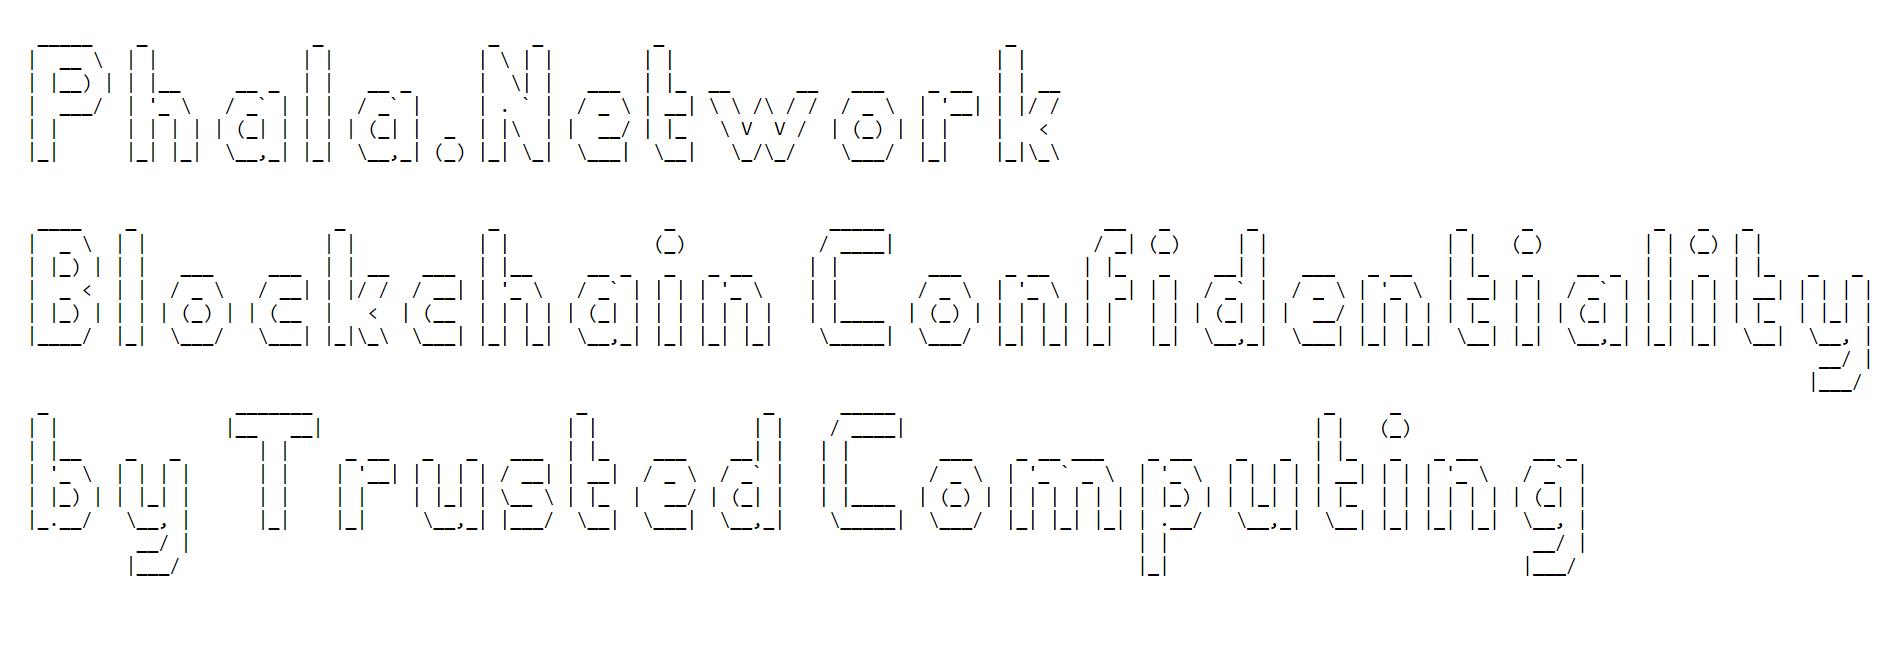 2020-07-24_13-39-14